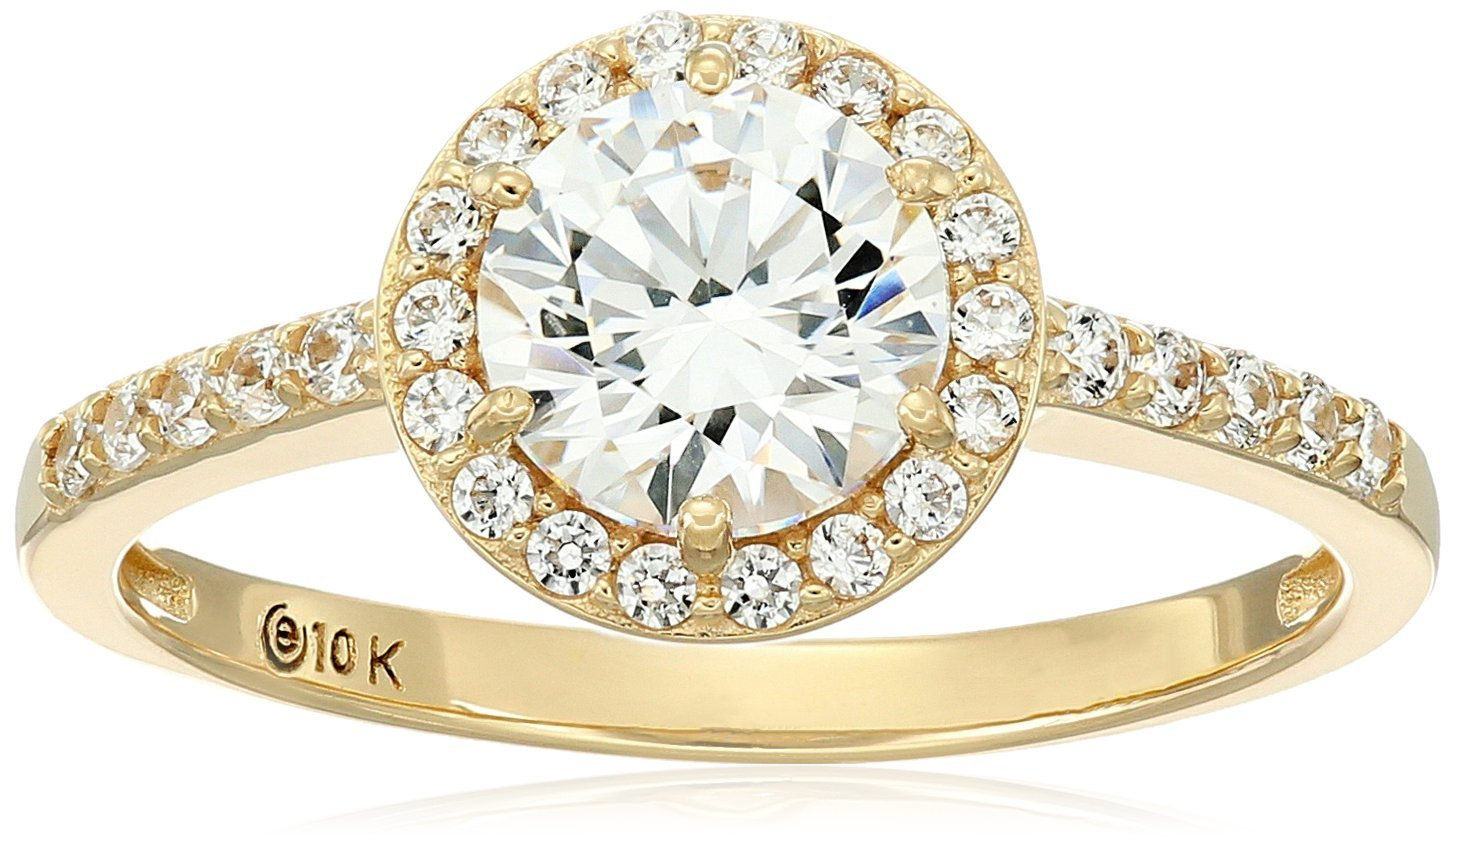 10k Gold Made with Swarovski Zirconia Round Halo Ring, Size 8